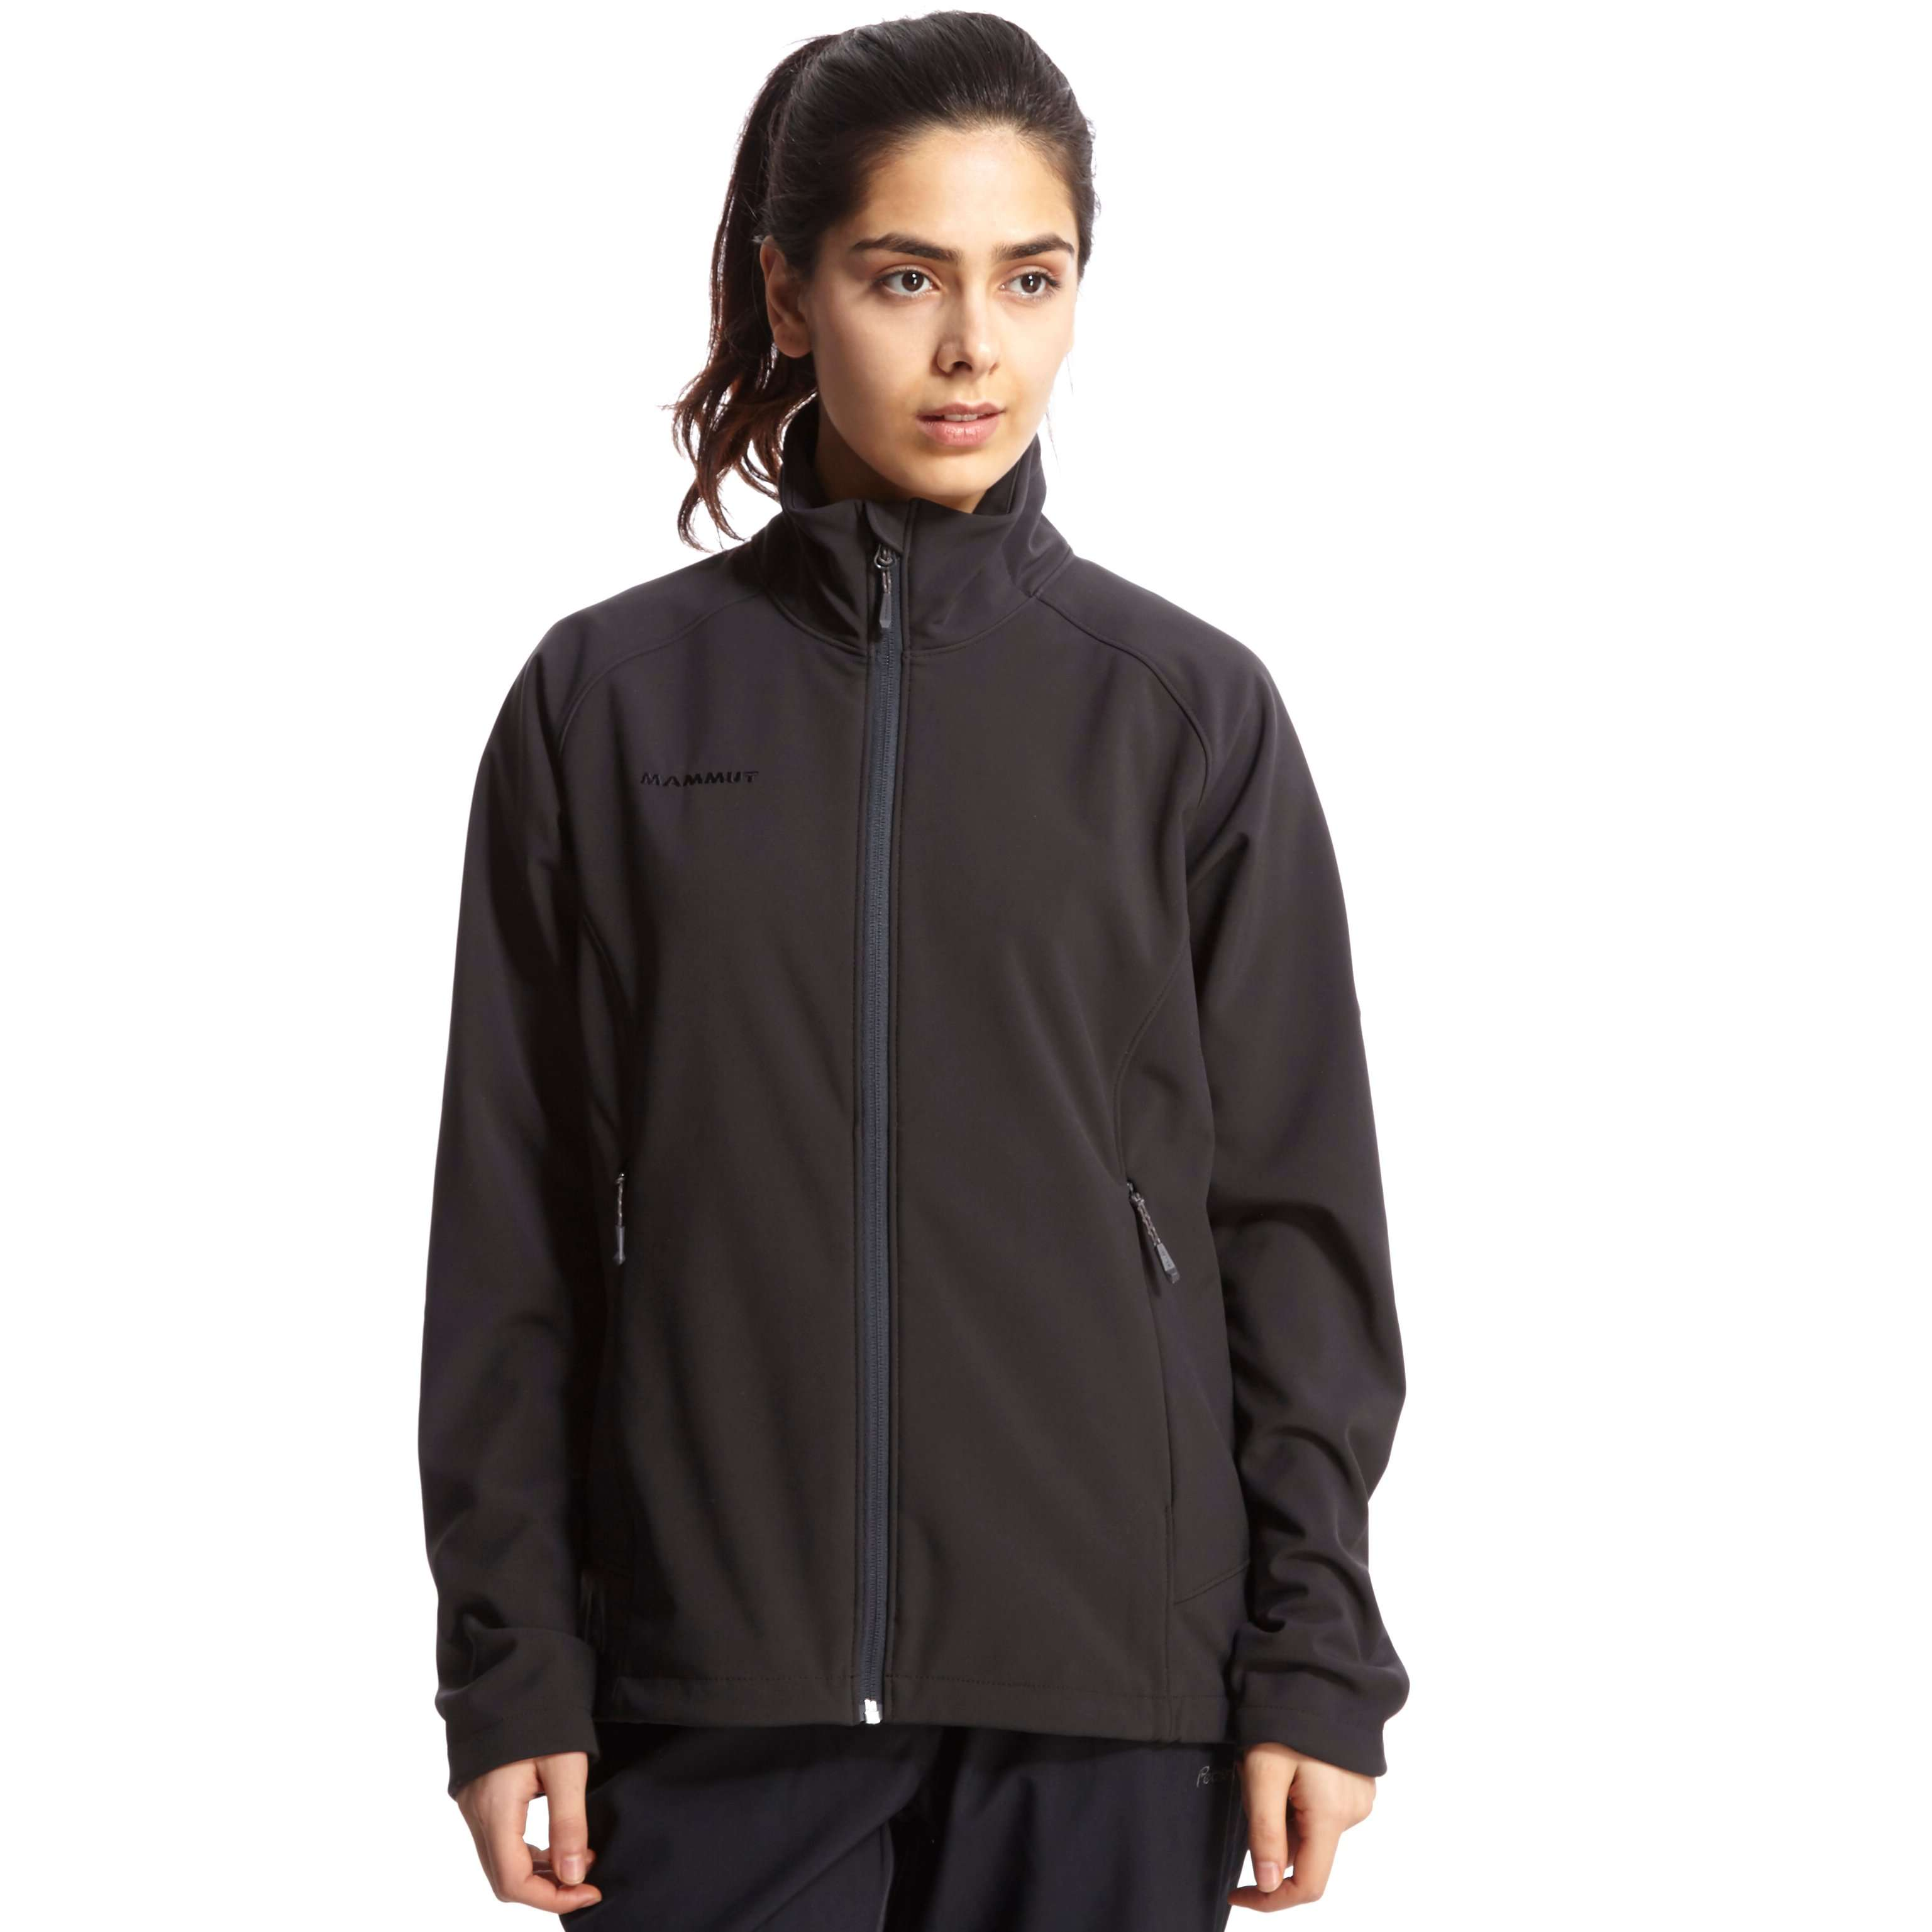 MAMMUT Women's Ladakh Softshell Jacket